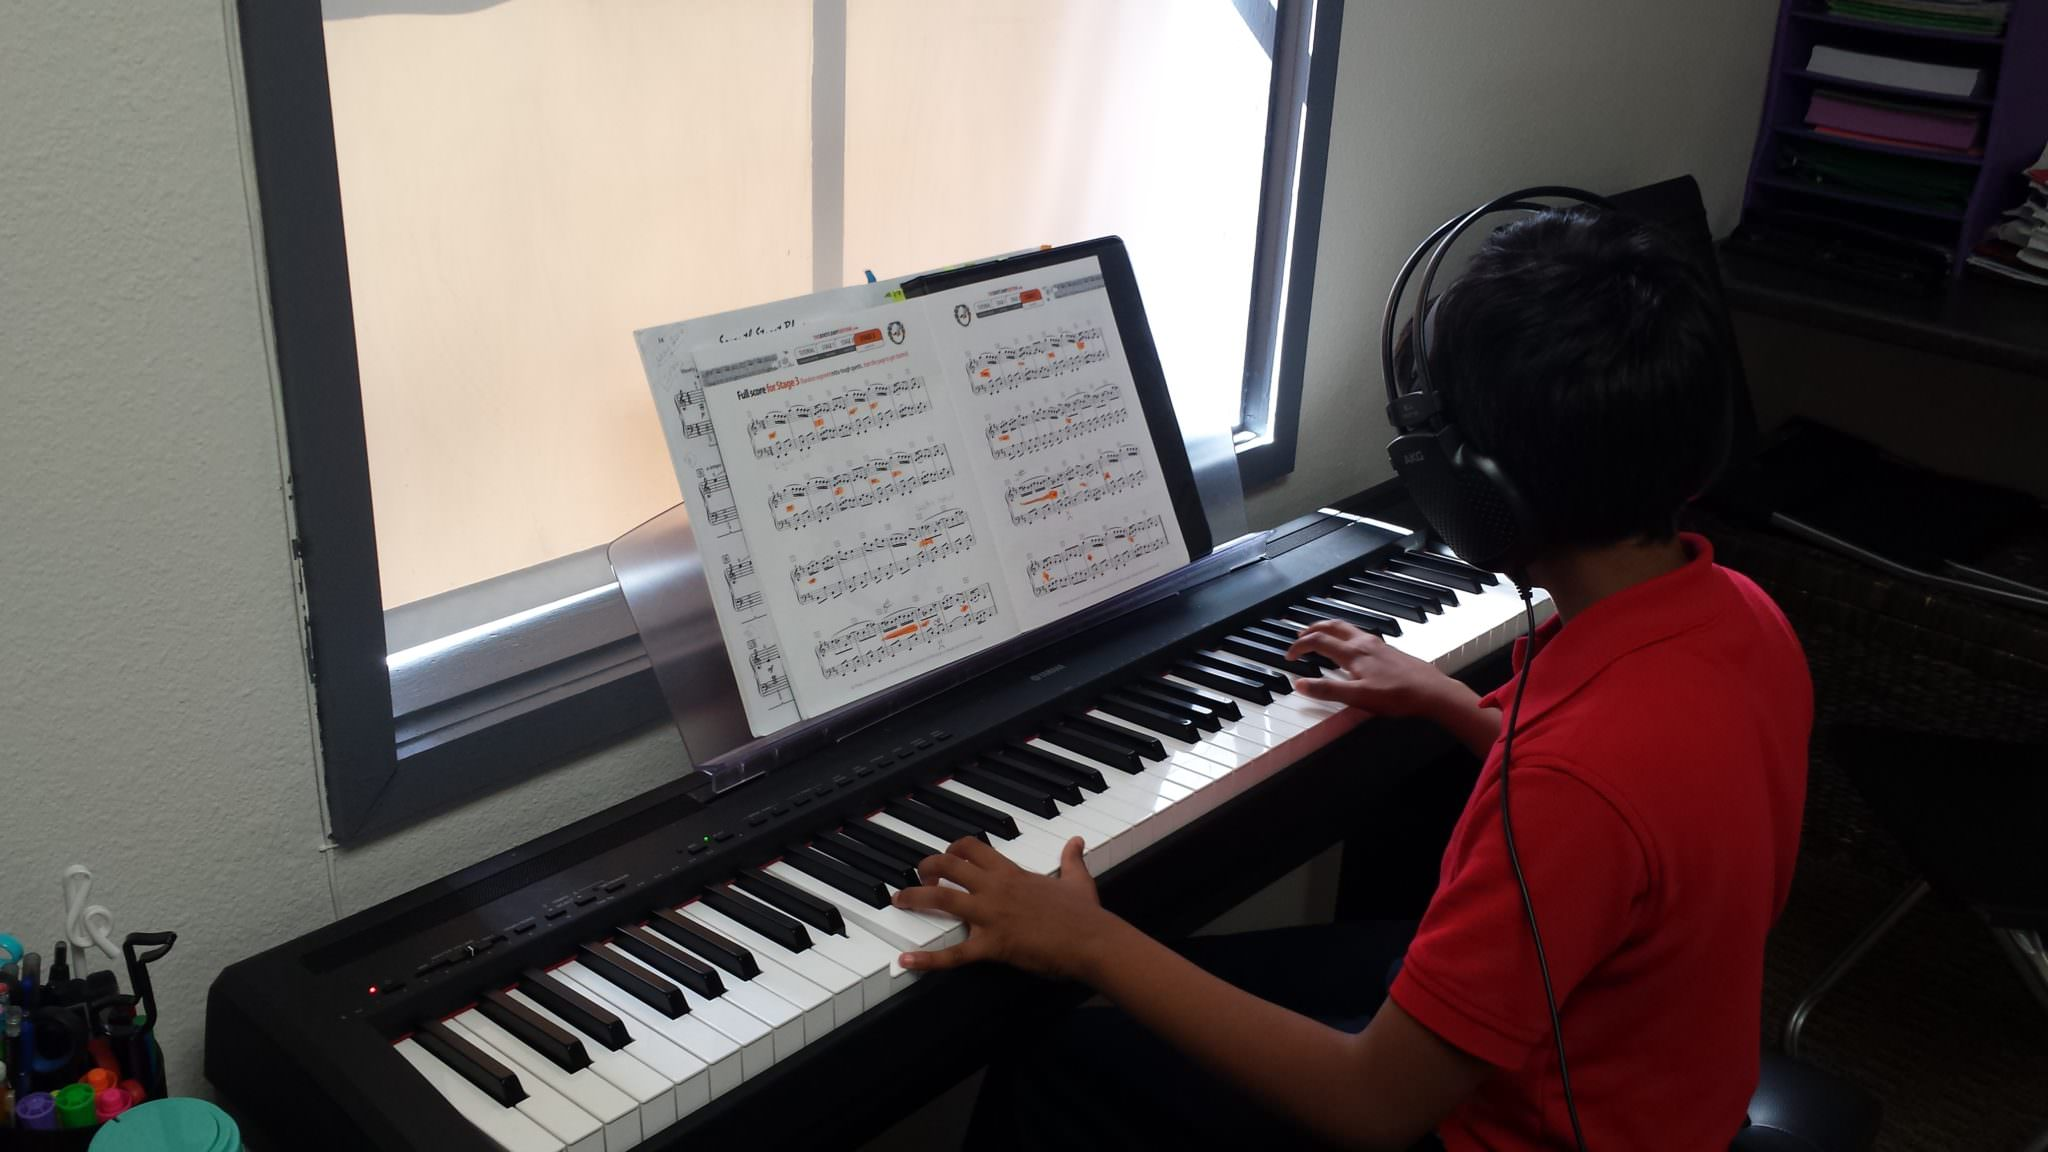 Purchasing Digital Pianos (Keyboards)